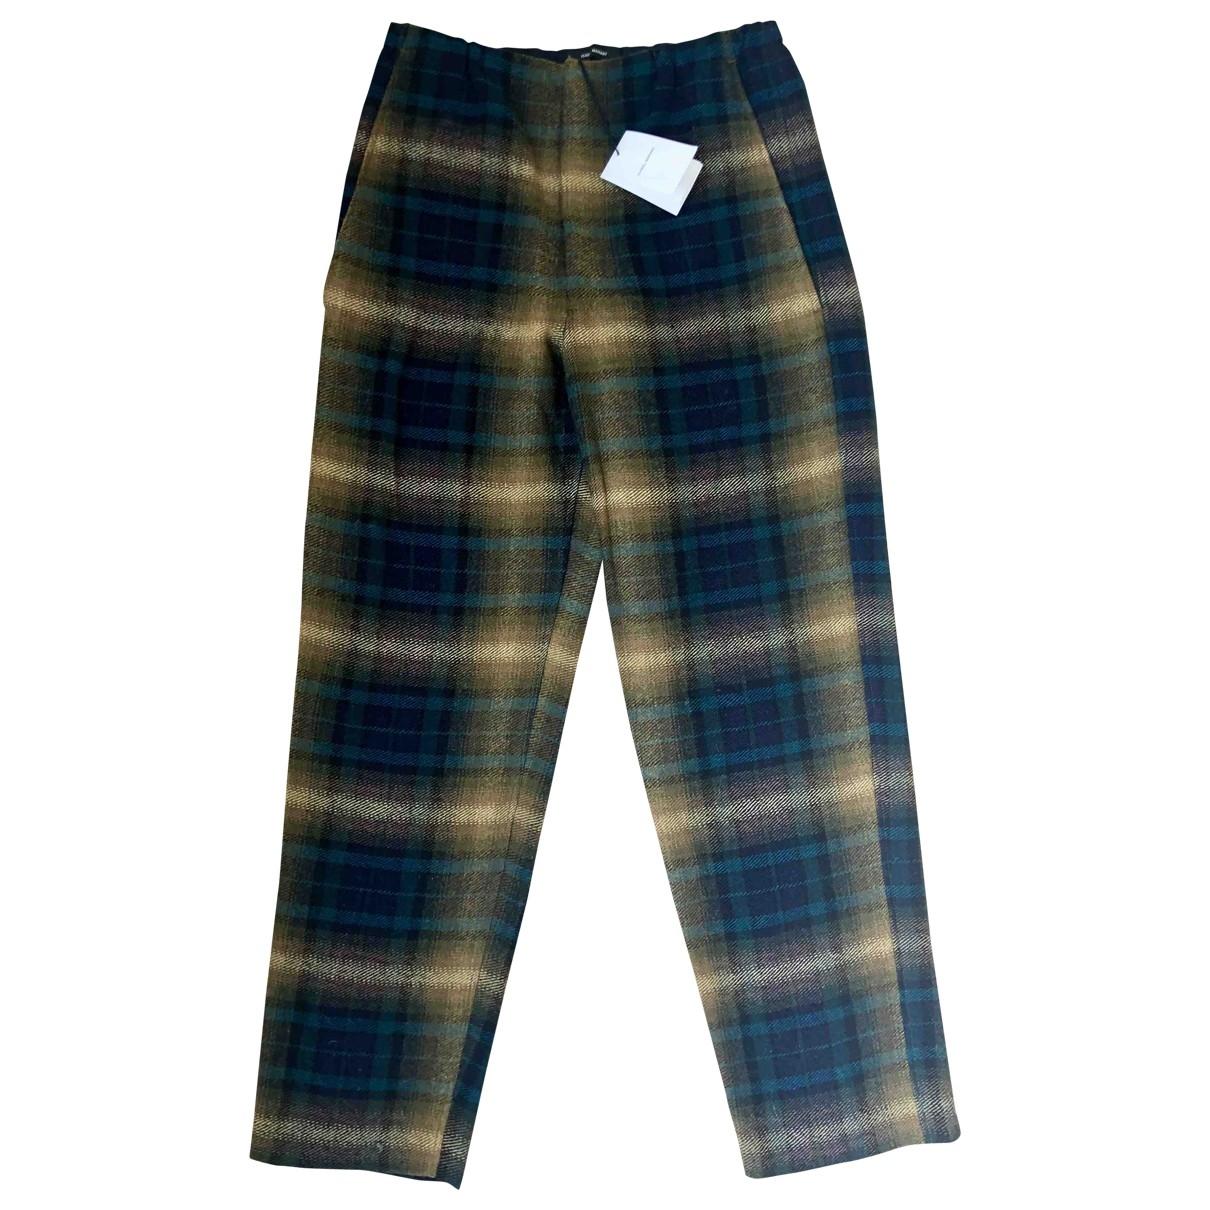 Pantalon de Lana Isabel Marant